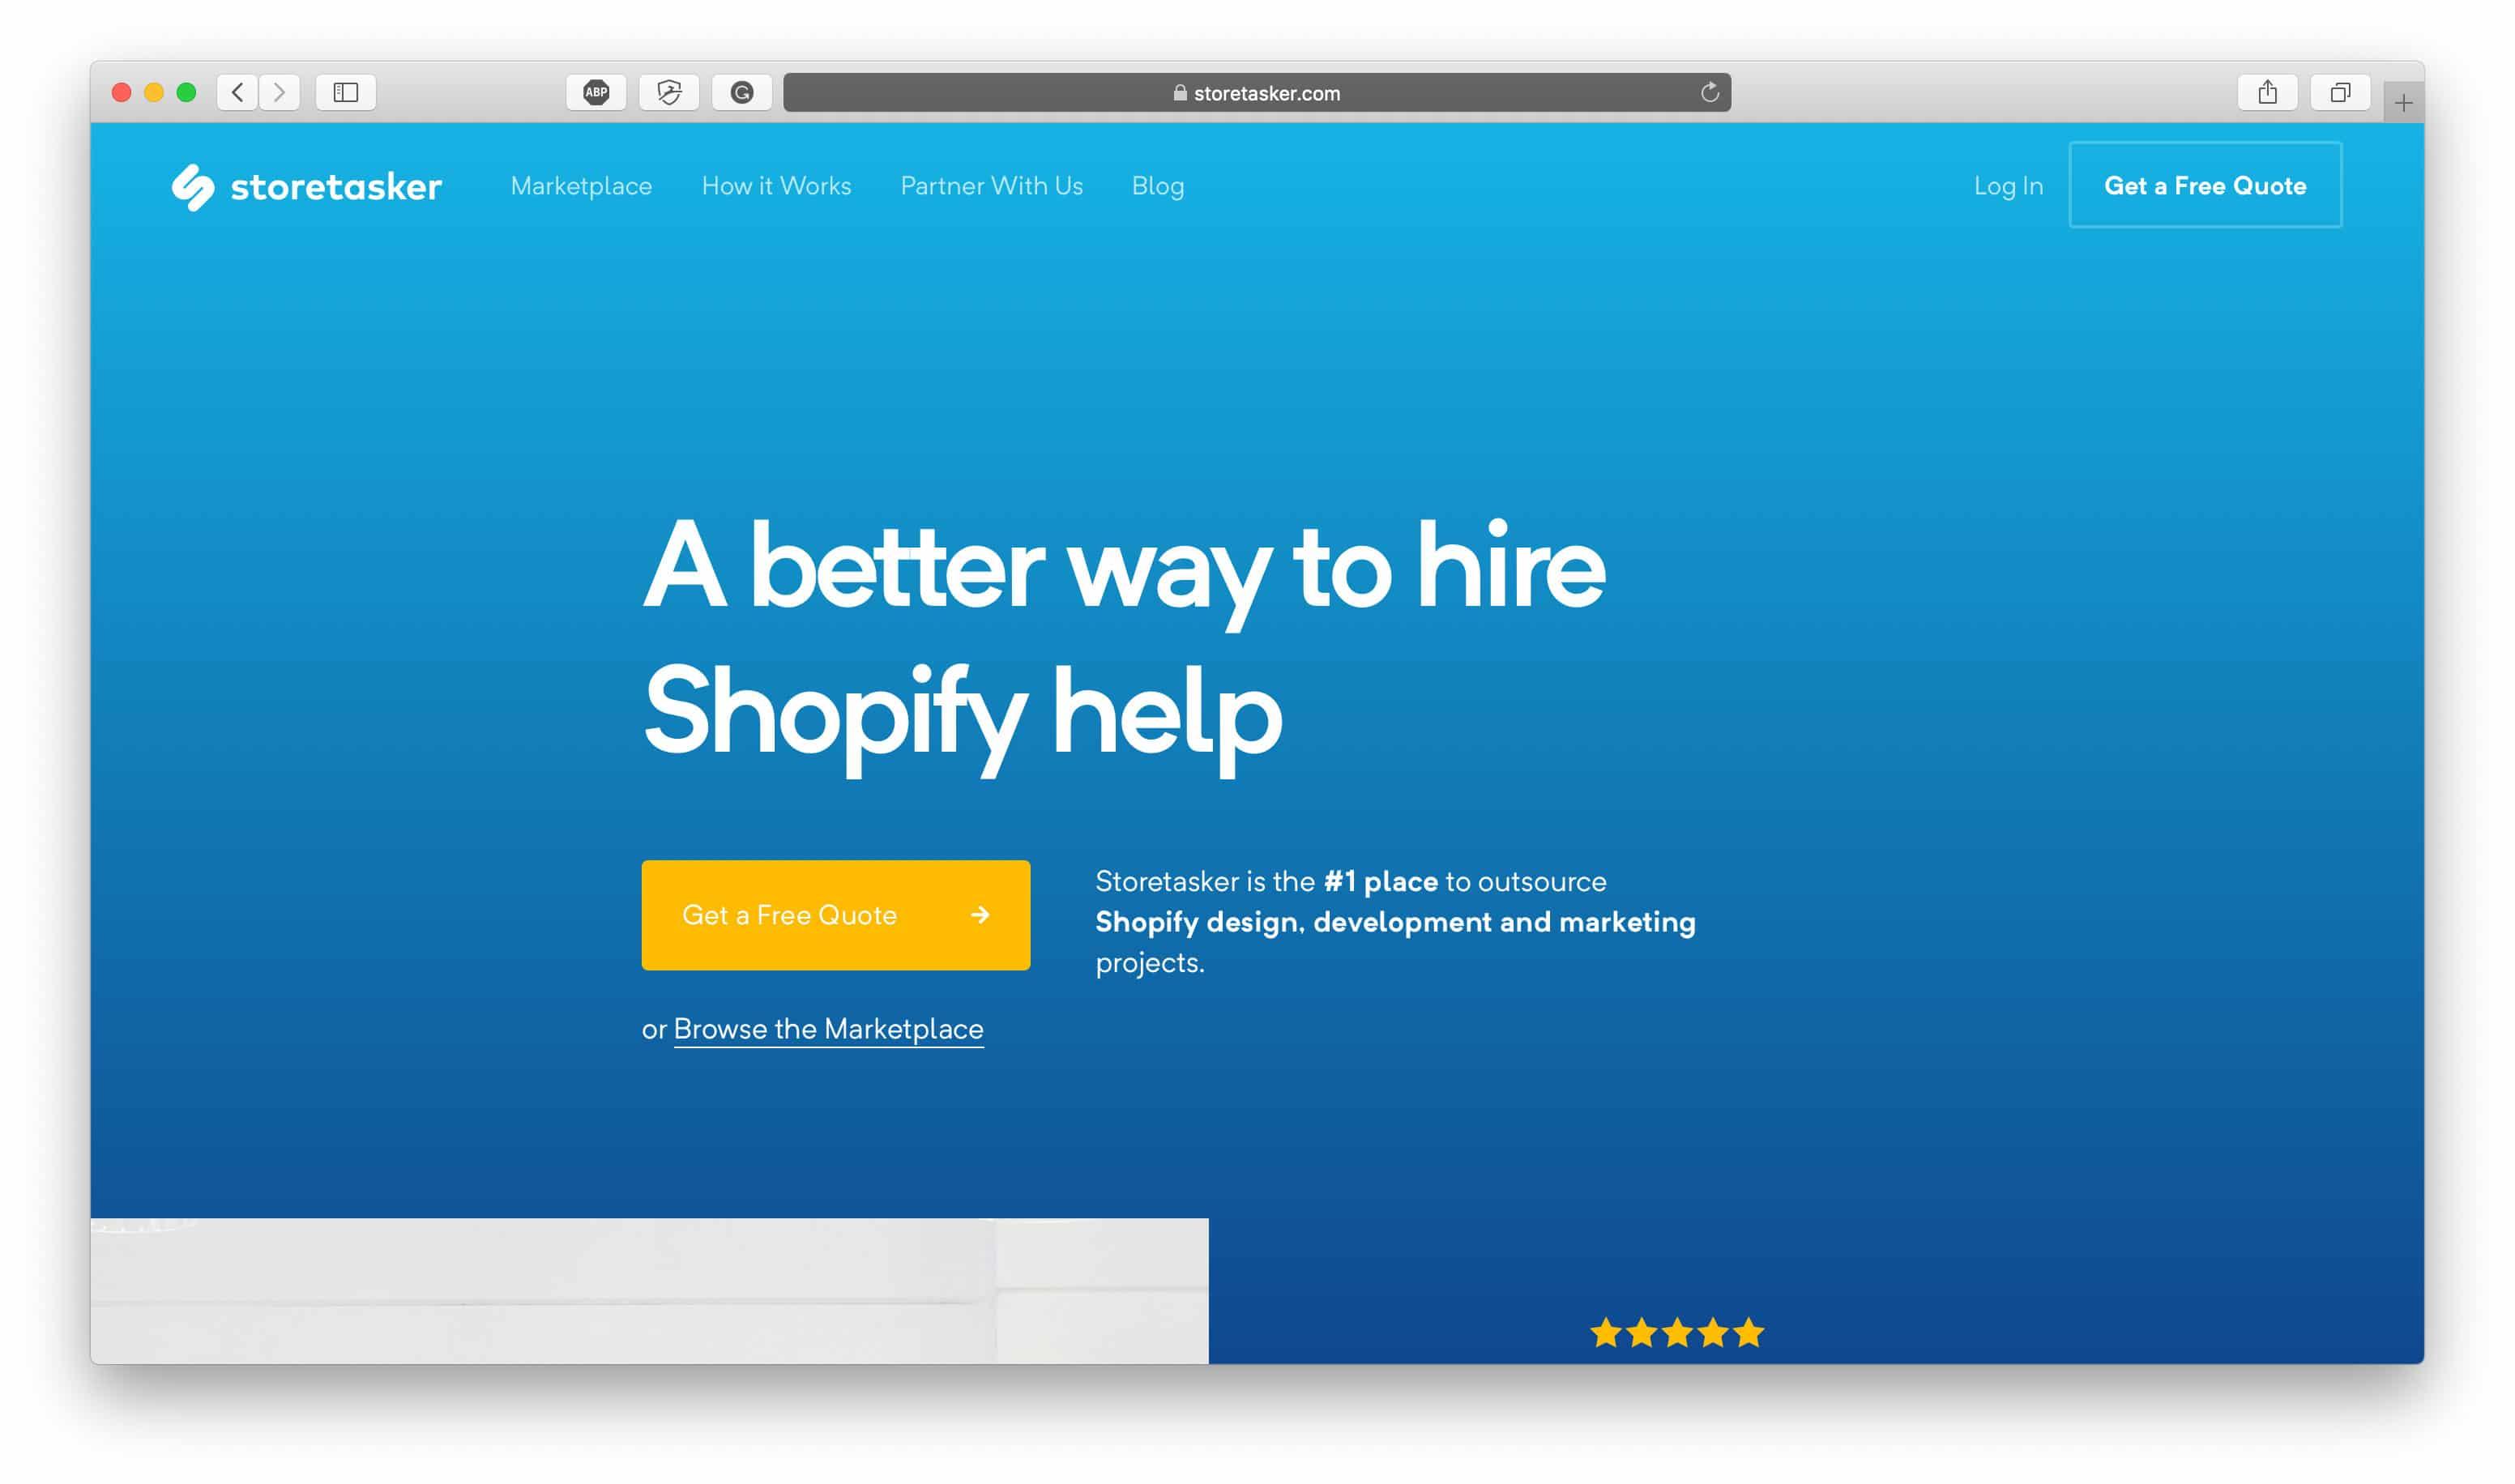 StoreTasker Ecommerce Outsourcing